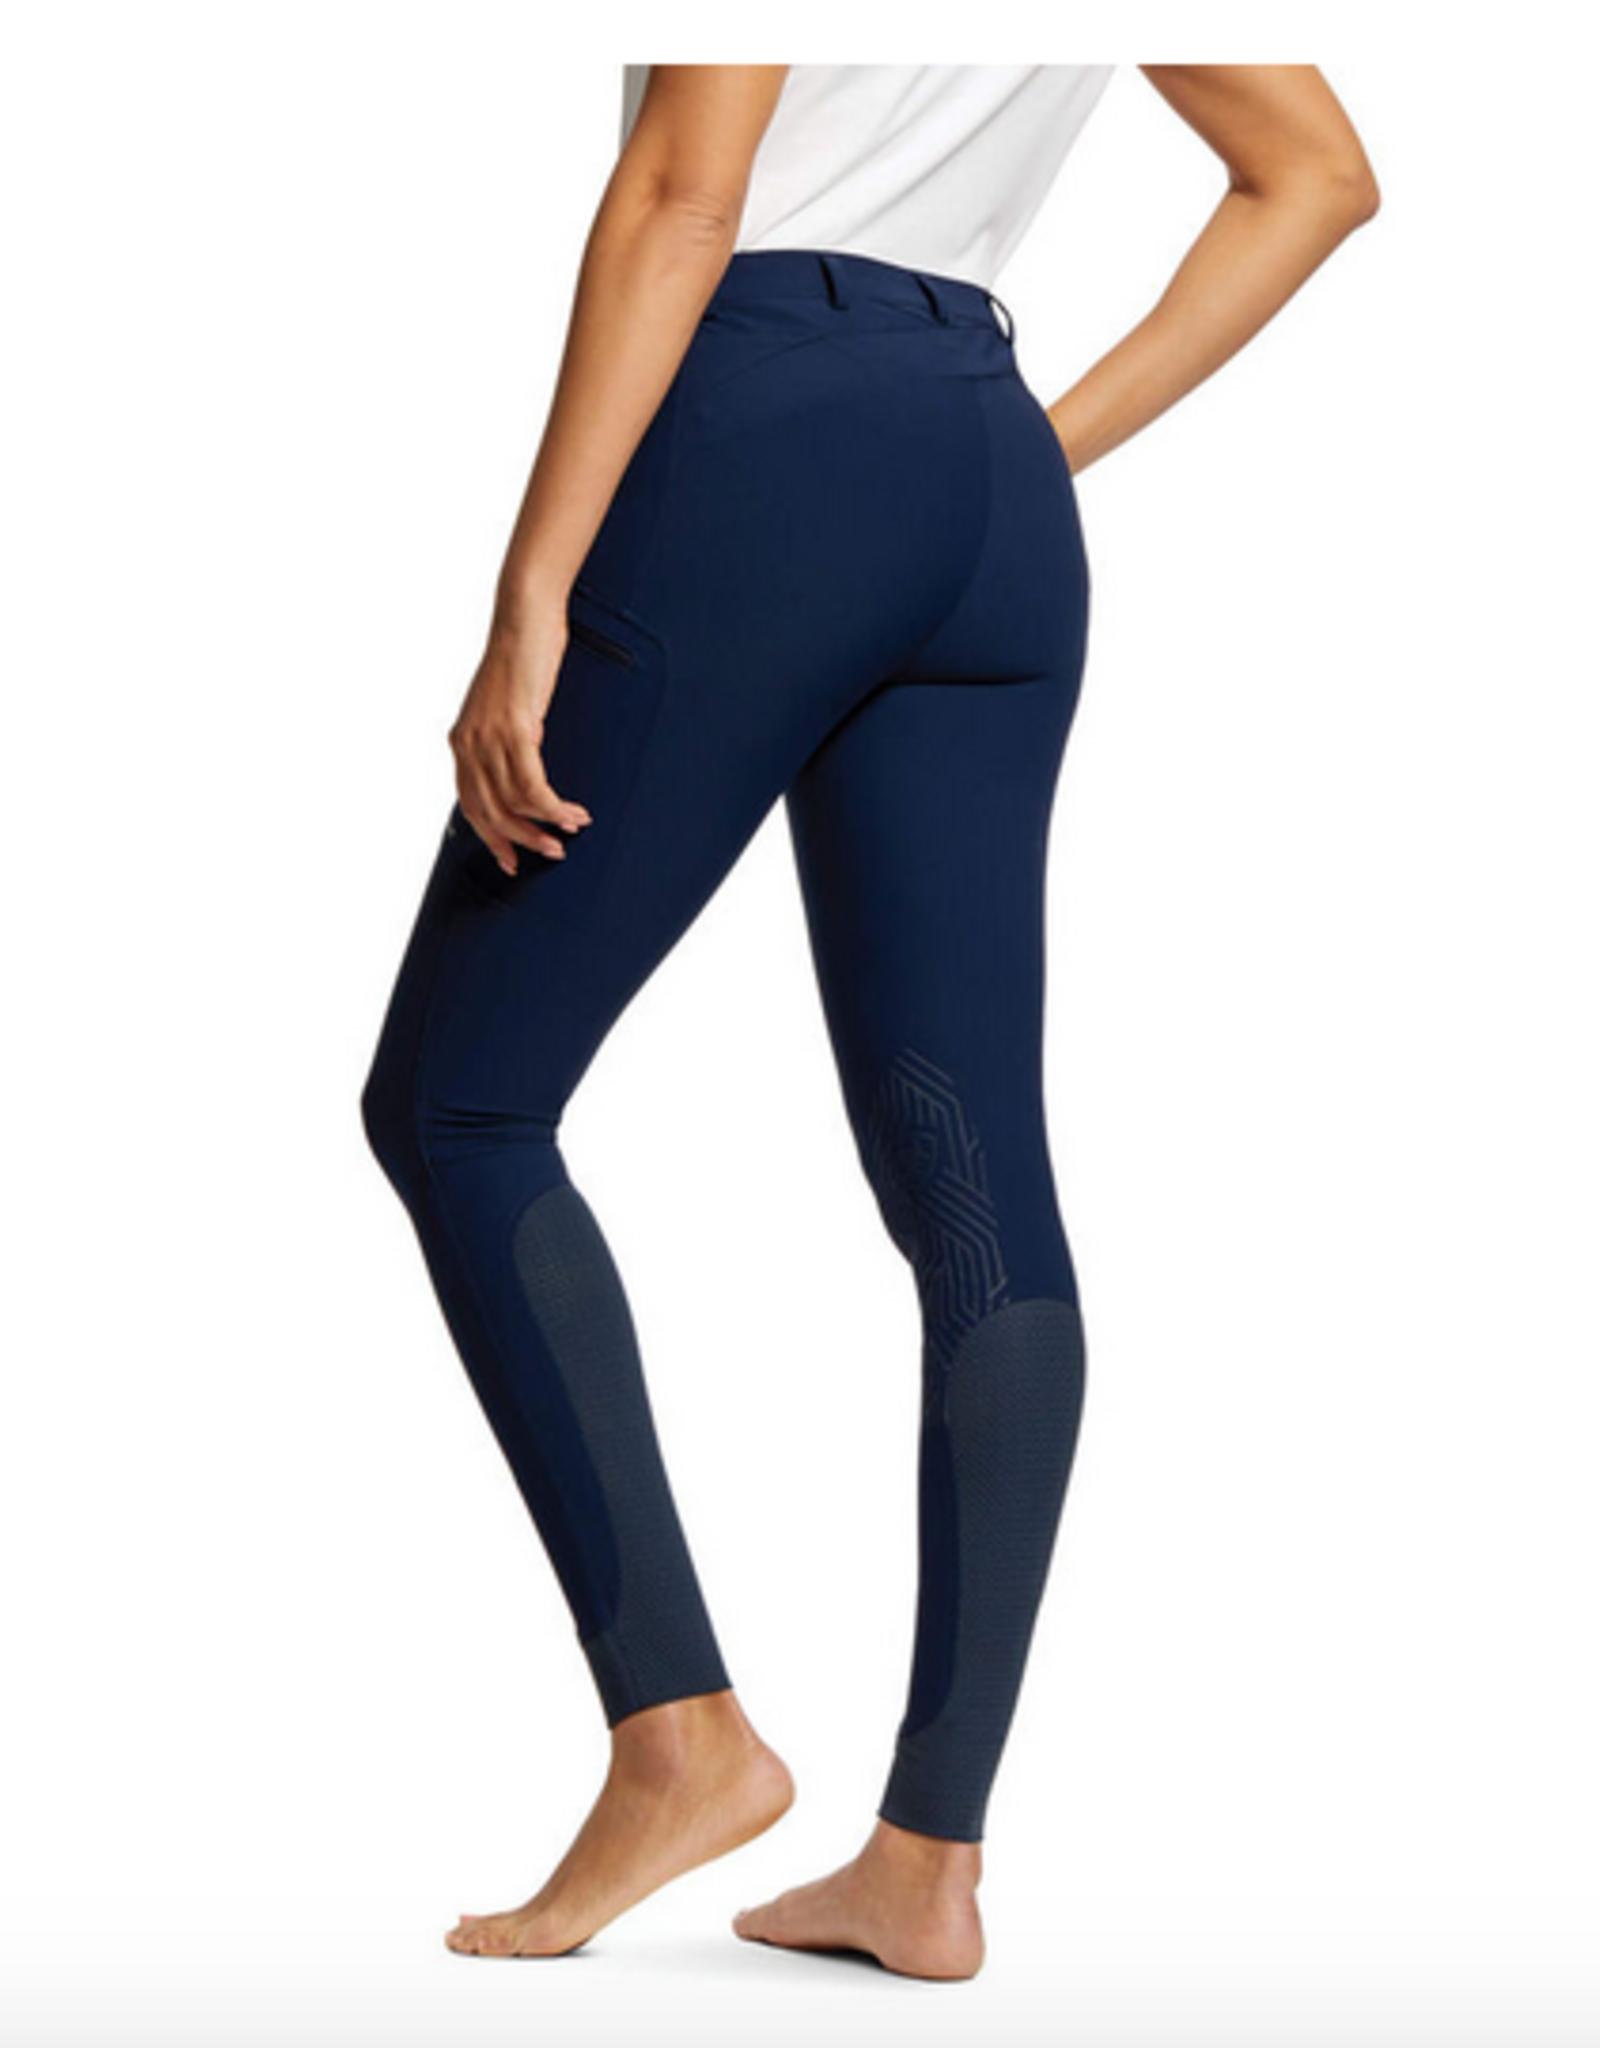 Ariat Ladies' Triton Grip Knee Patch Breeches